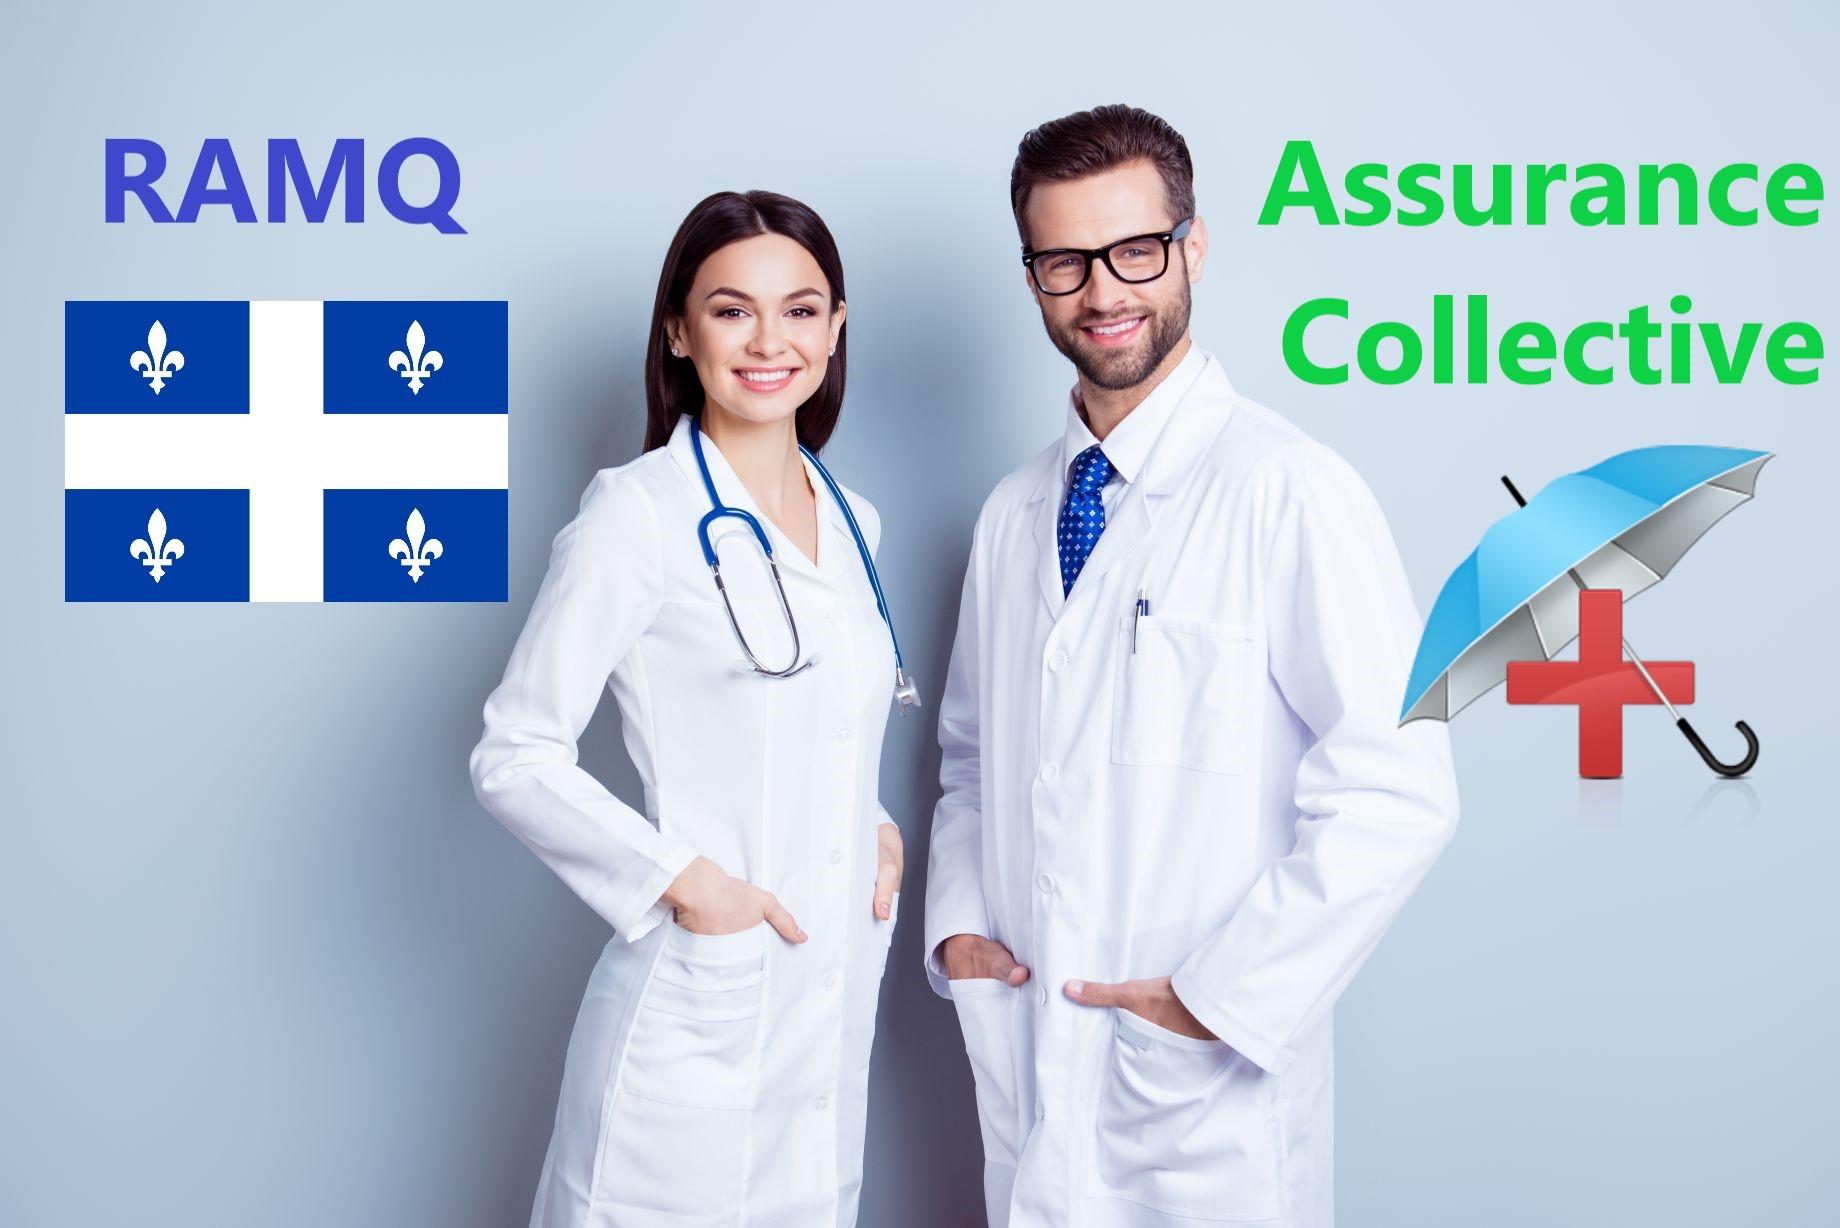 assurance RAMQ vs collectif